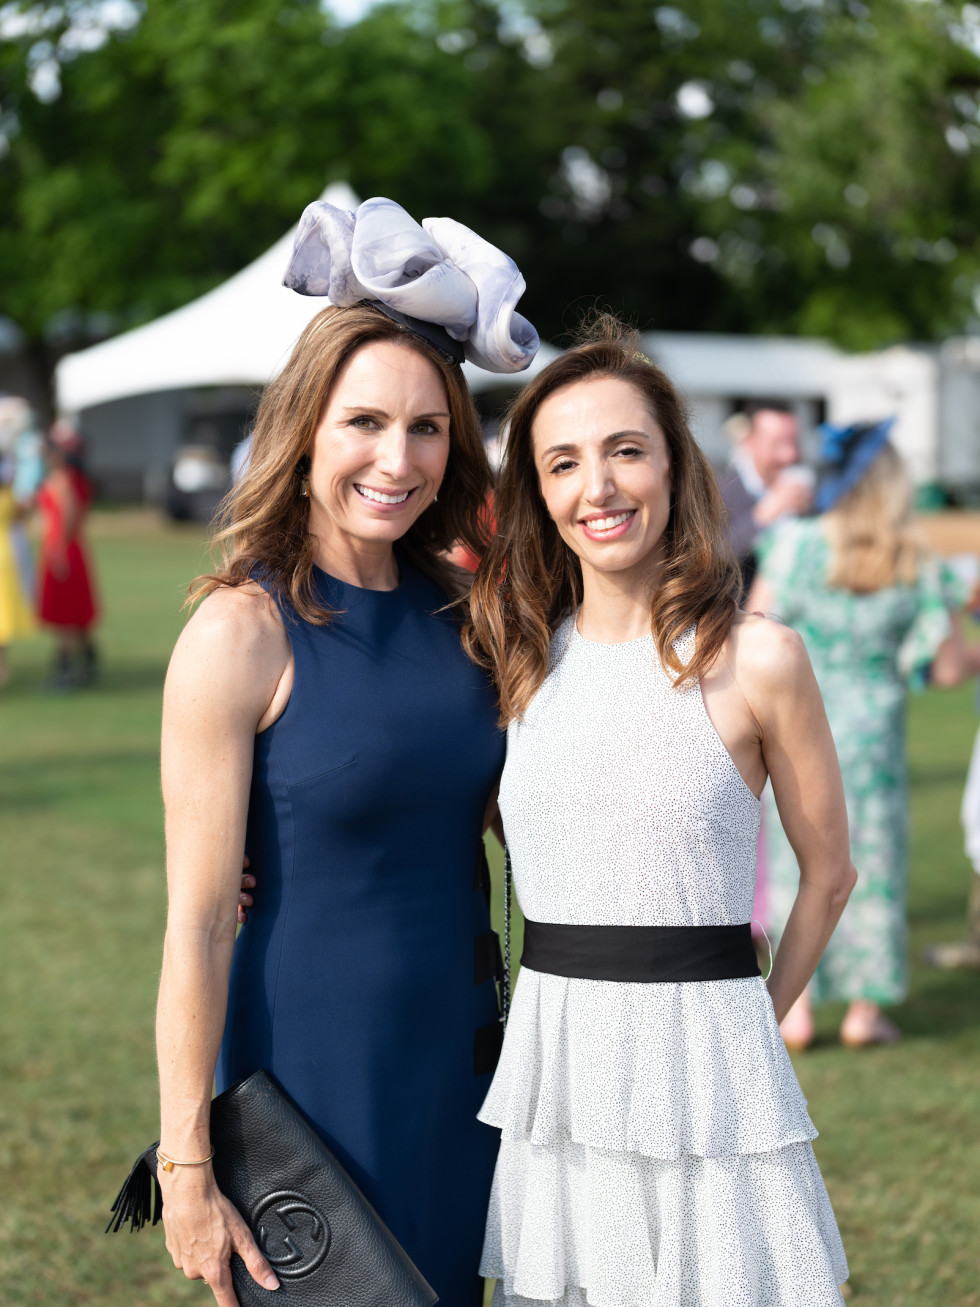 Bo's Place Kentucky Derby 2021 Houston Polo Club Brooke Bentley Gunst and Lila Sharifian